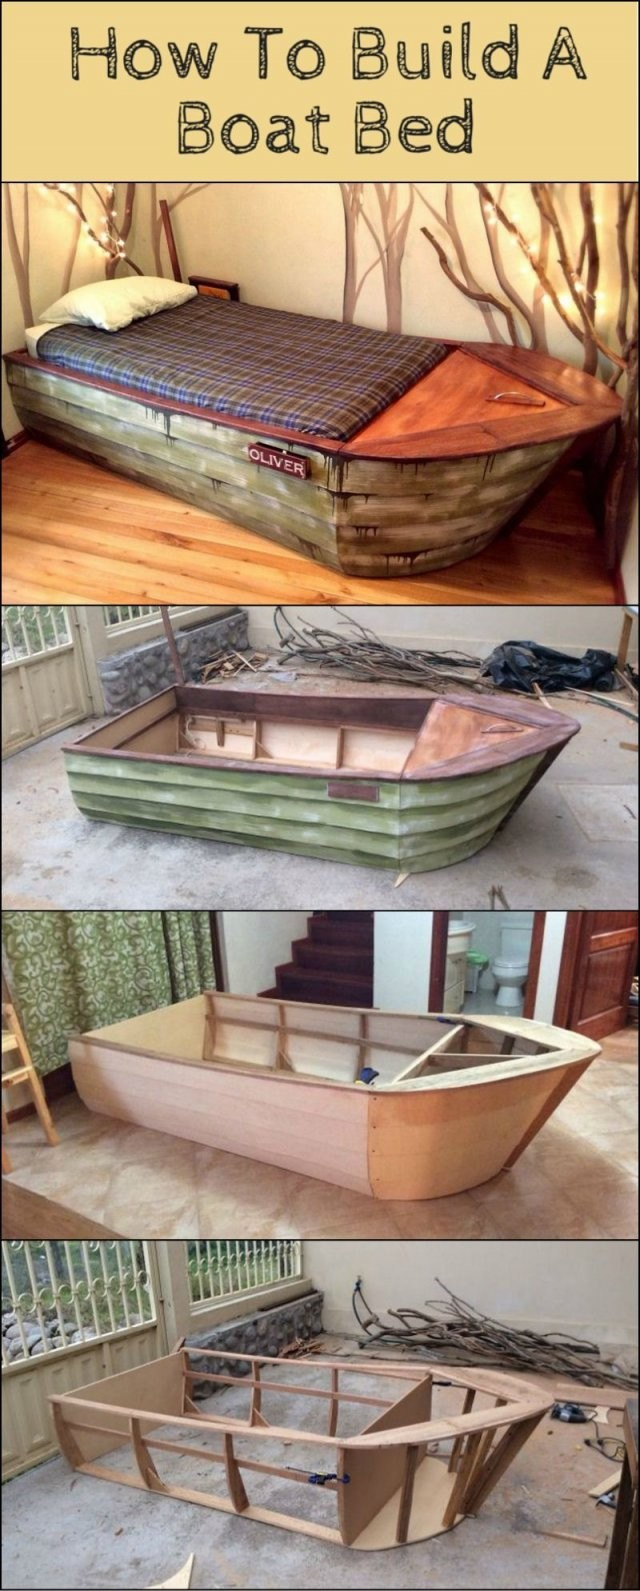 ⛵ Piratenbett Selber Bauen  Anleitung Piraten Bett  Piratenzimmer von Boot Regal Selber Bauen Photo